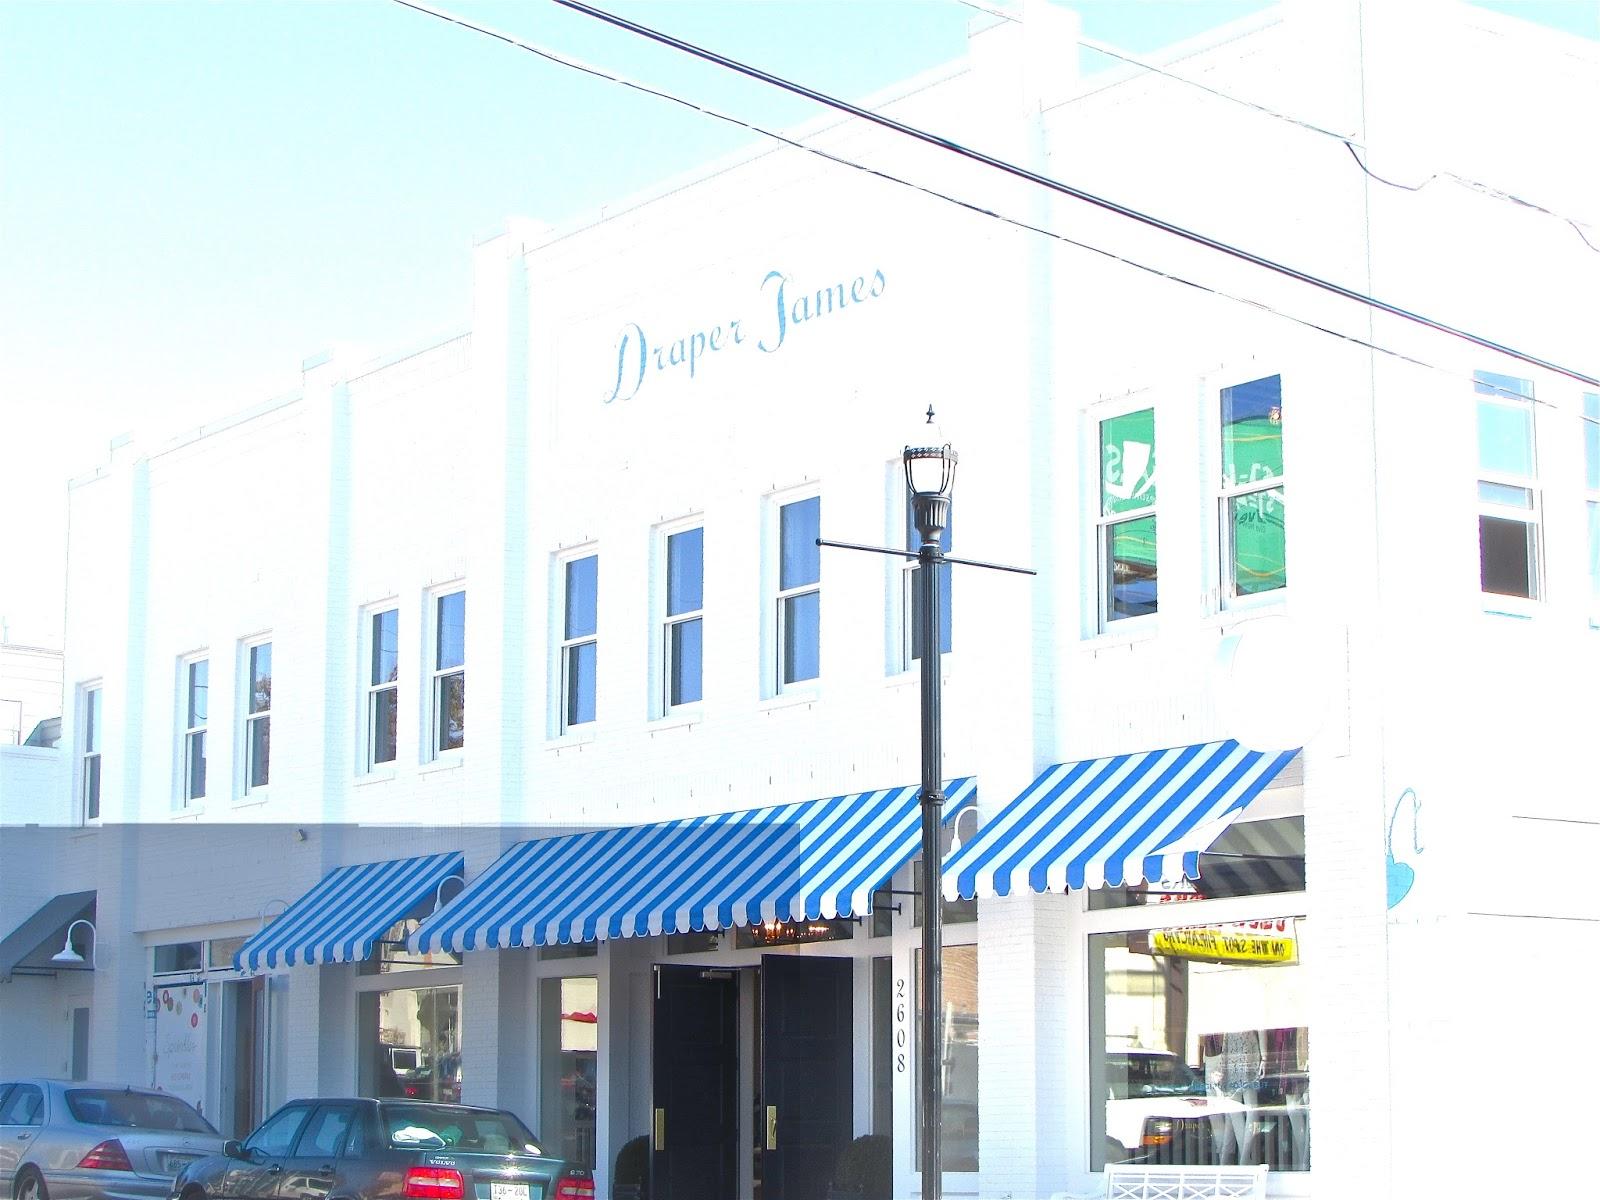 Draper James Storefront